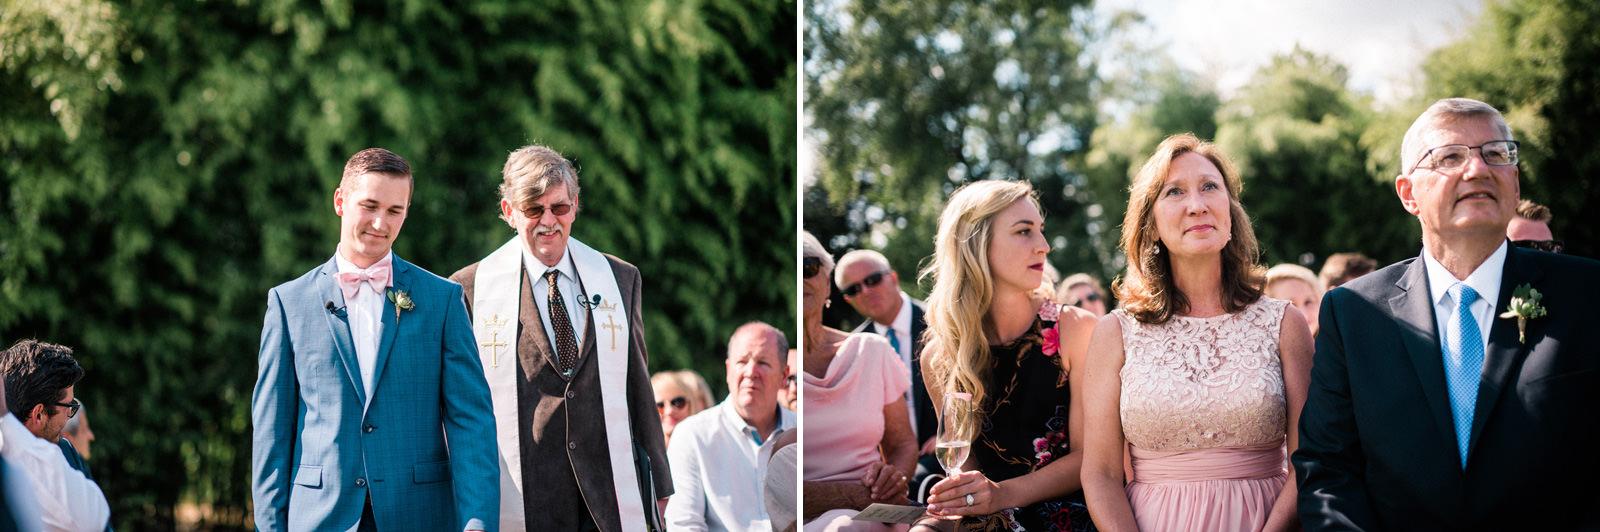 035-woodinville-lavendar-farm-wedding-with-golden-glowy-photos.jpg